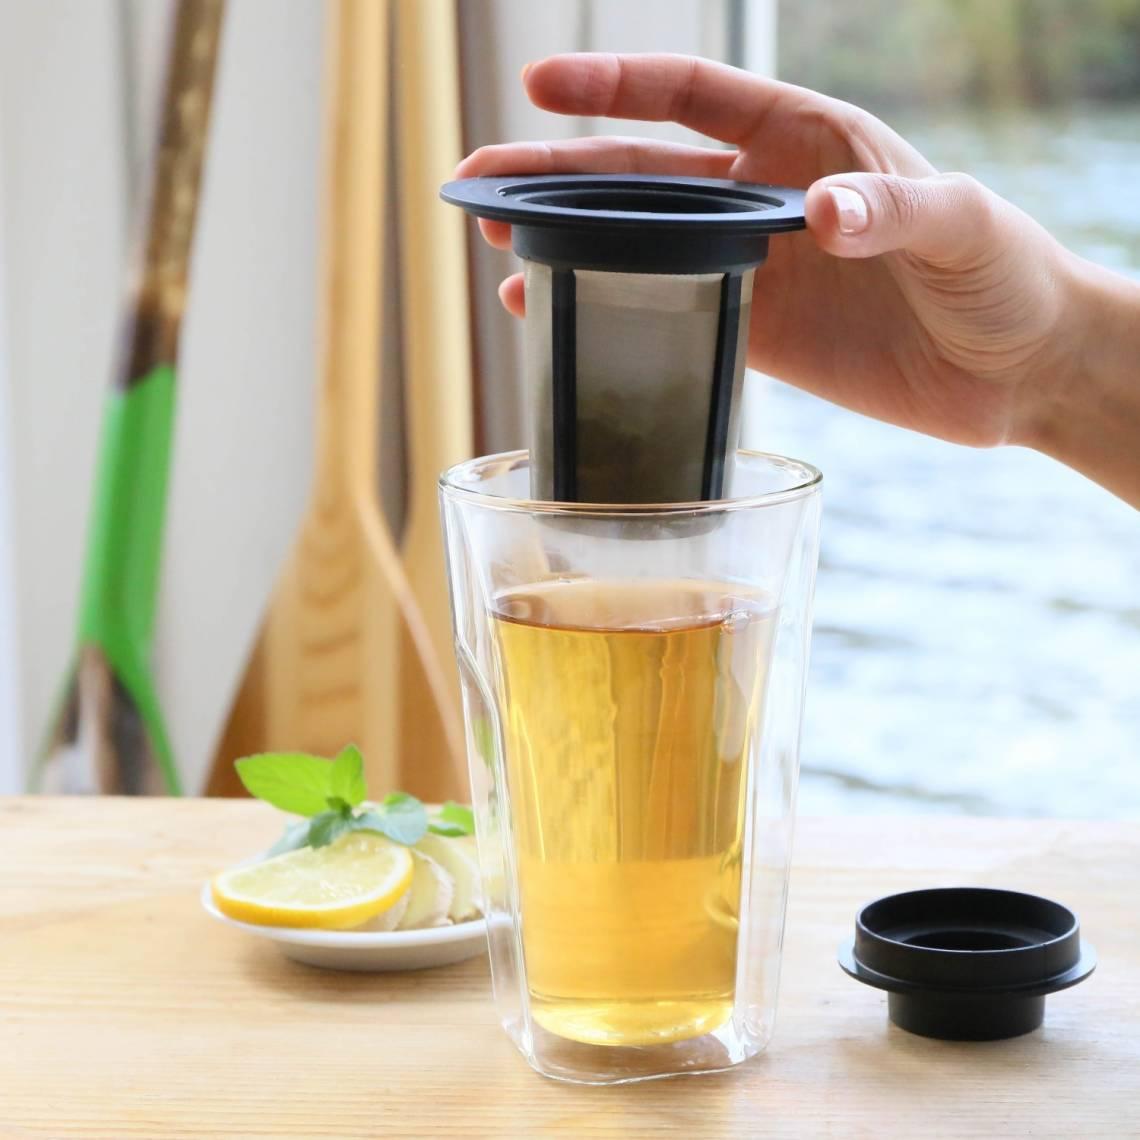 finum SMART BREW SYSTEM Teefilter  BREW SYSTEM 320 ml (6 oz)